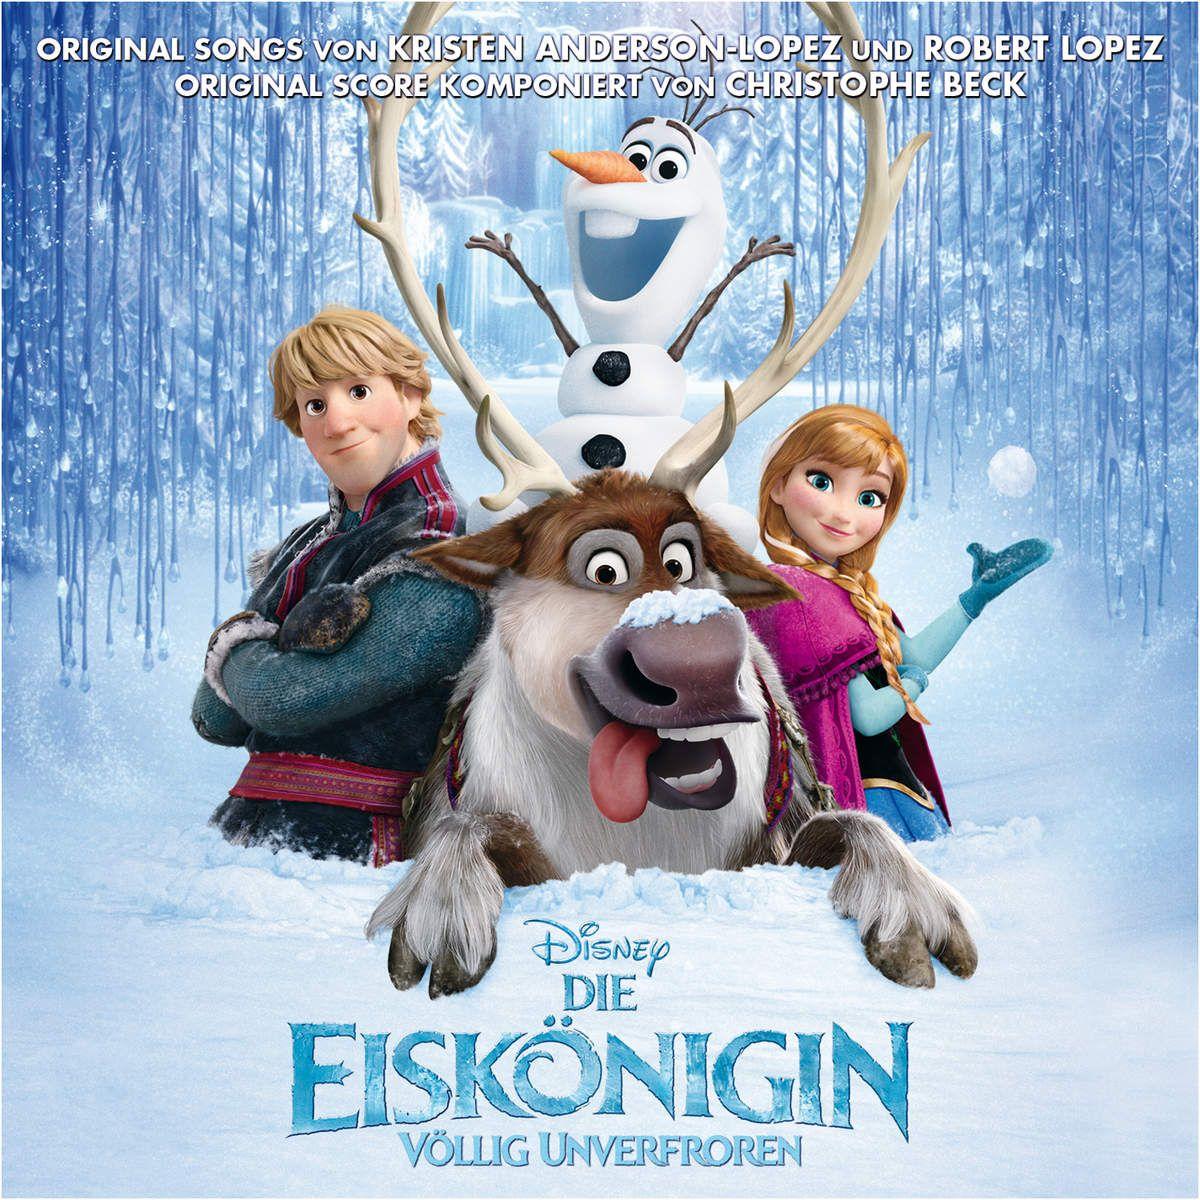 Soundtrack - Die Eiskönigin - Völlig Unverfroren album cover